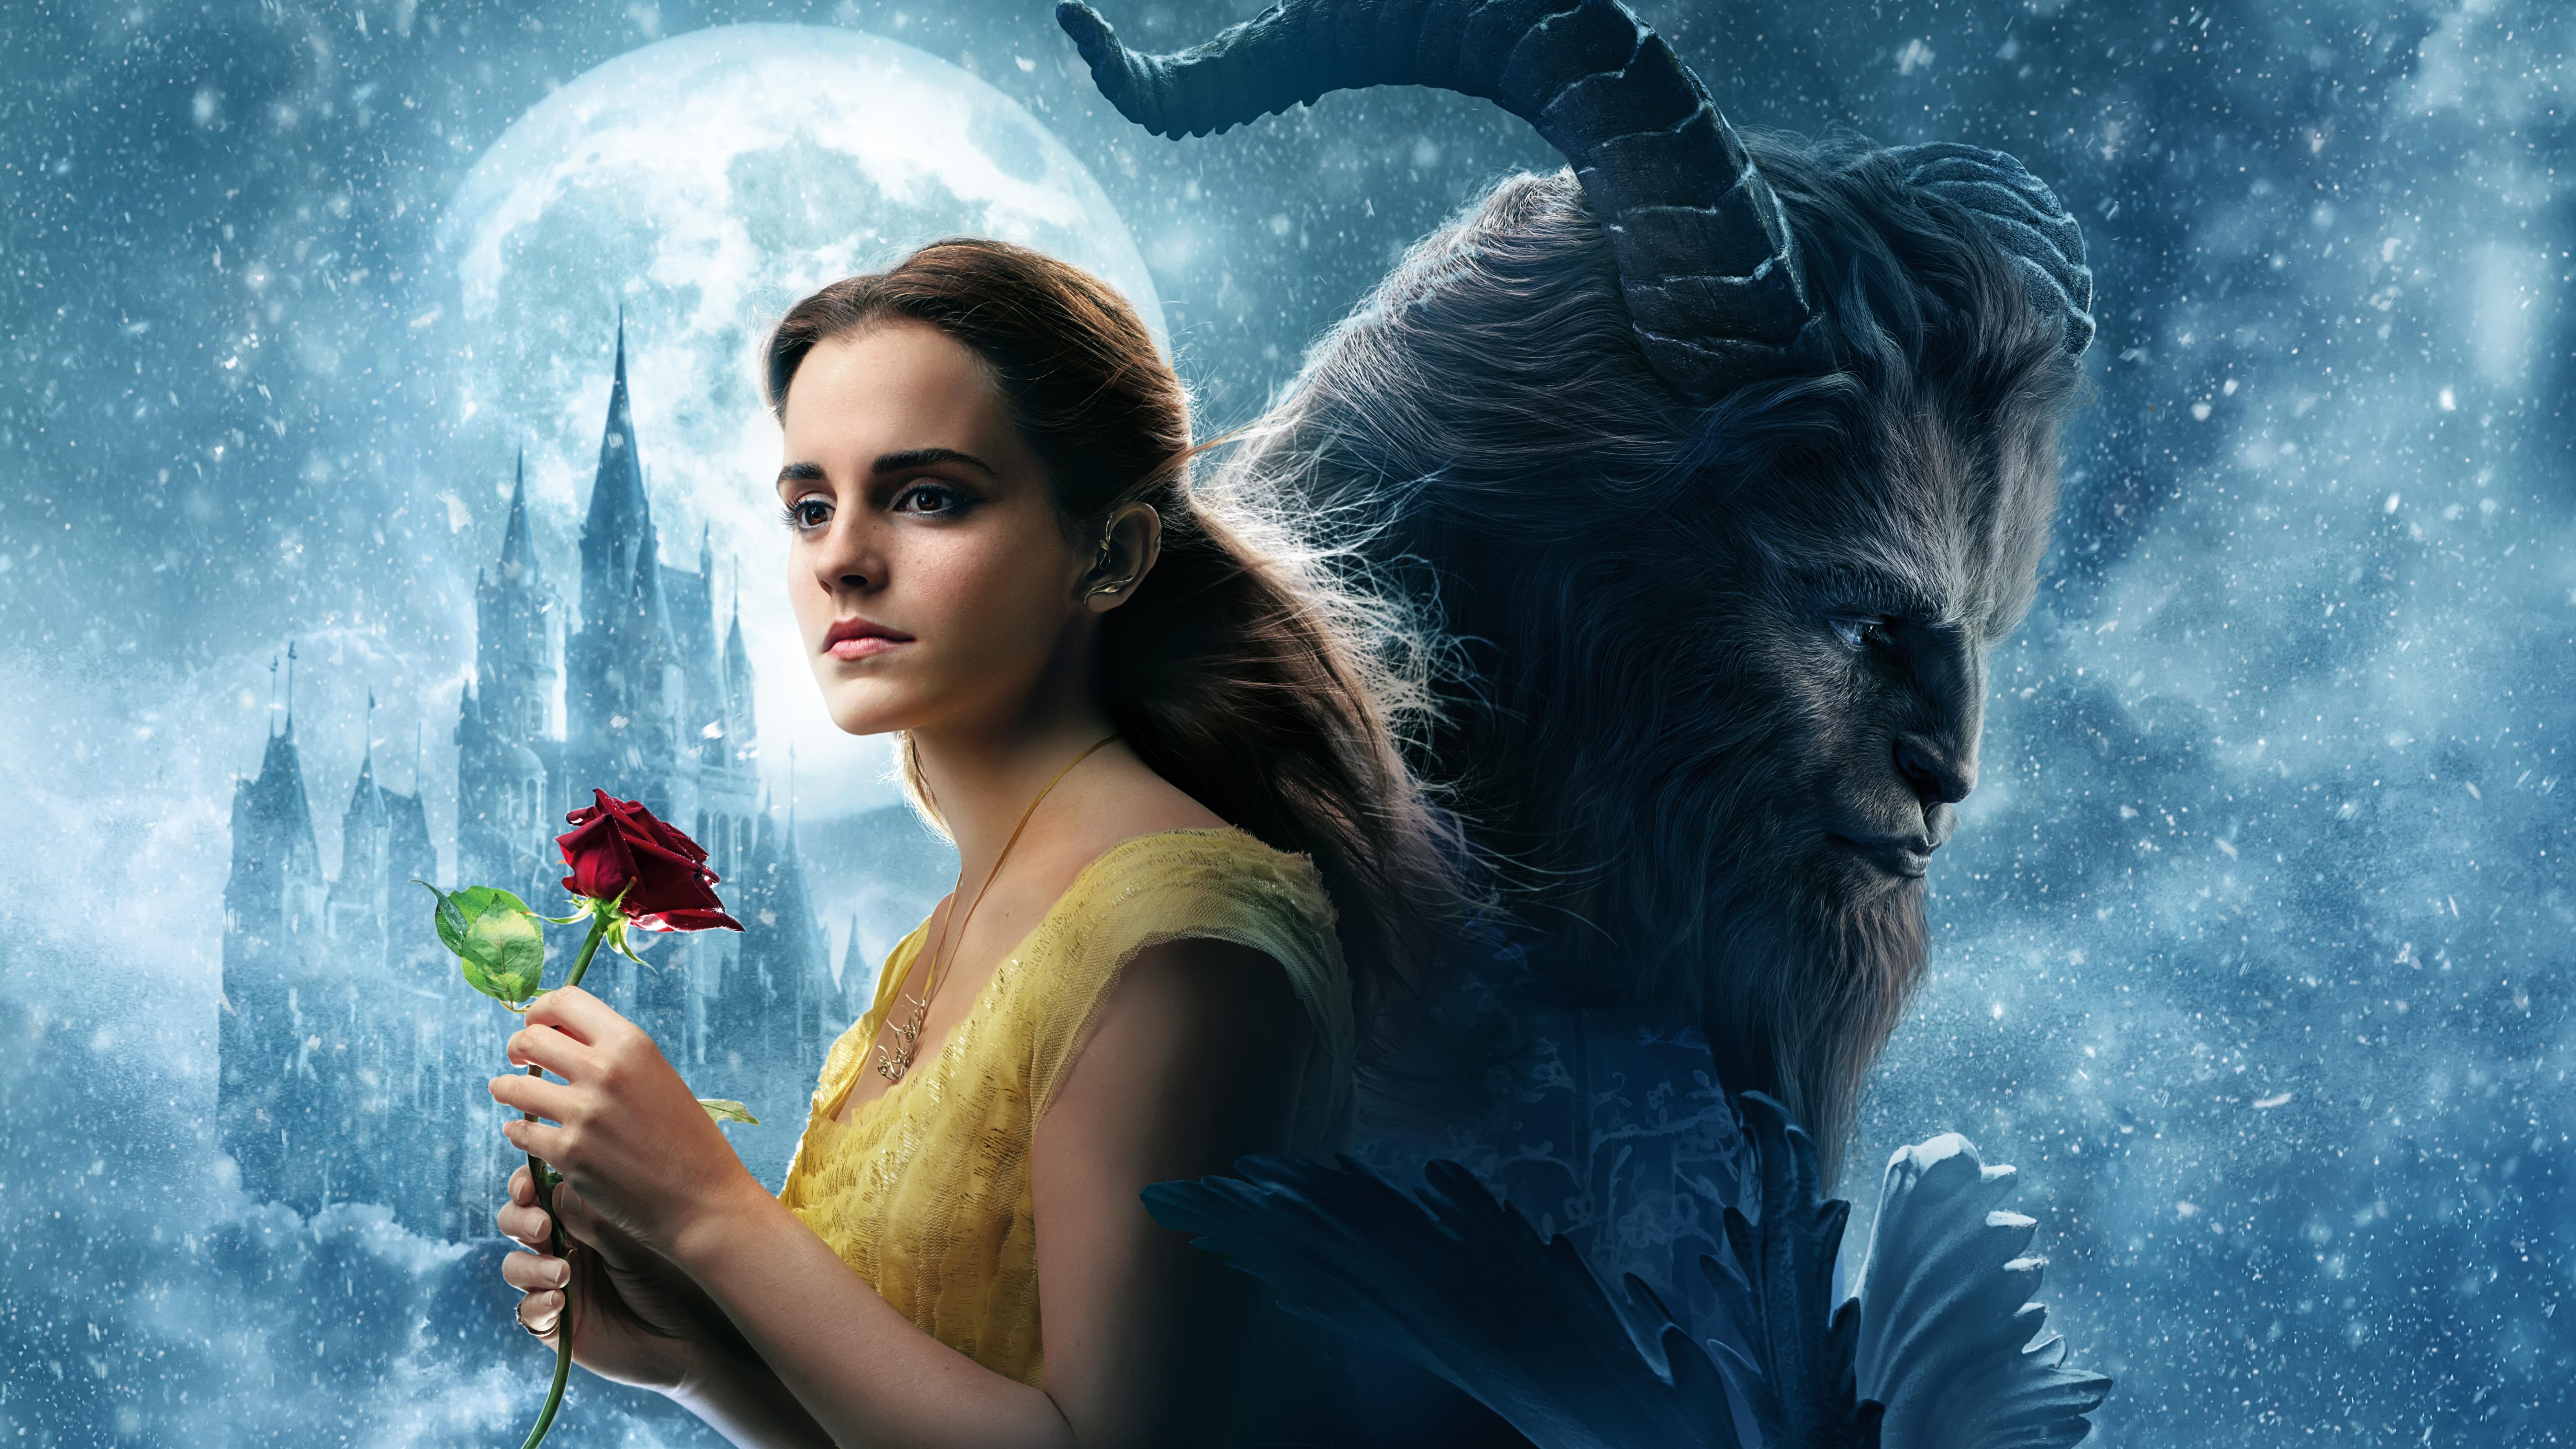 Гидонлайн фильмы 2018 красавица и чудовище